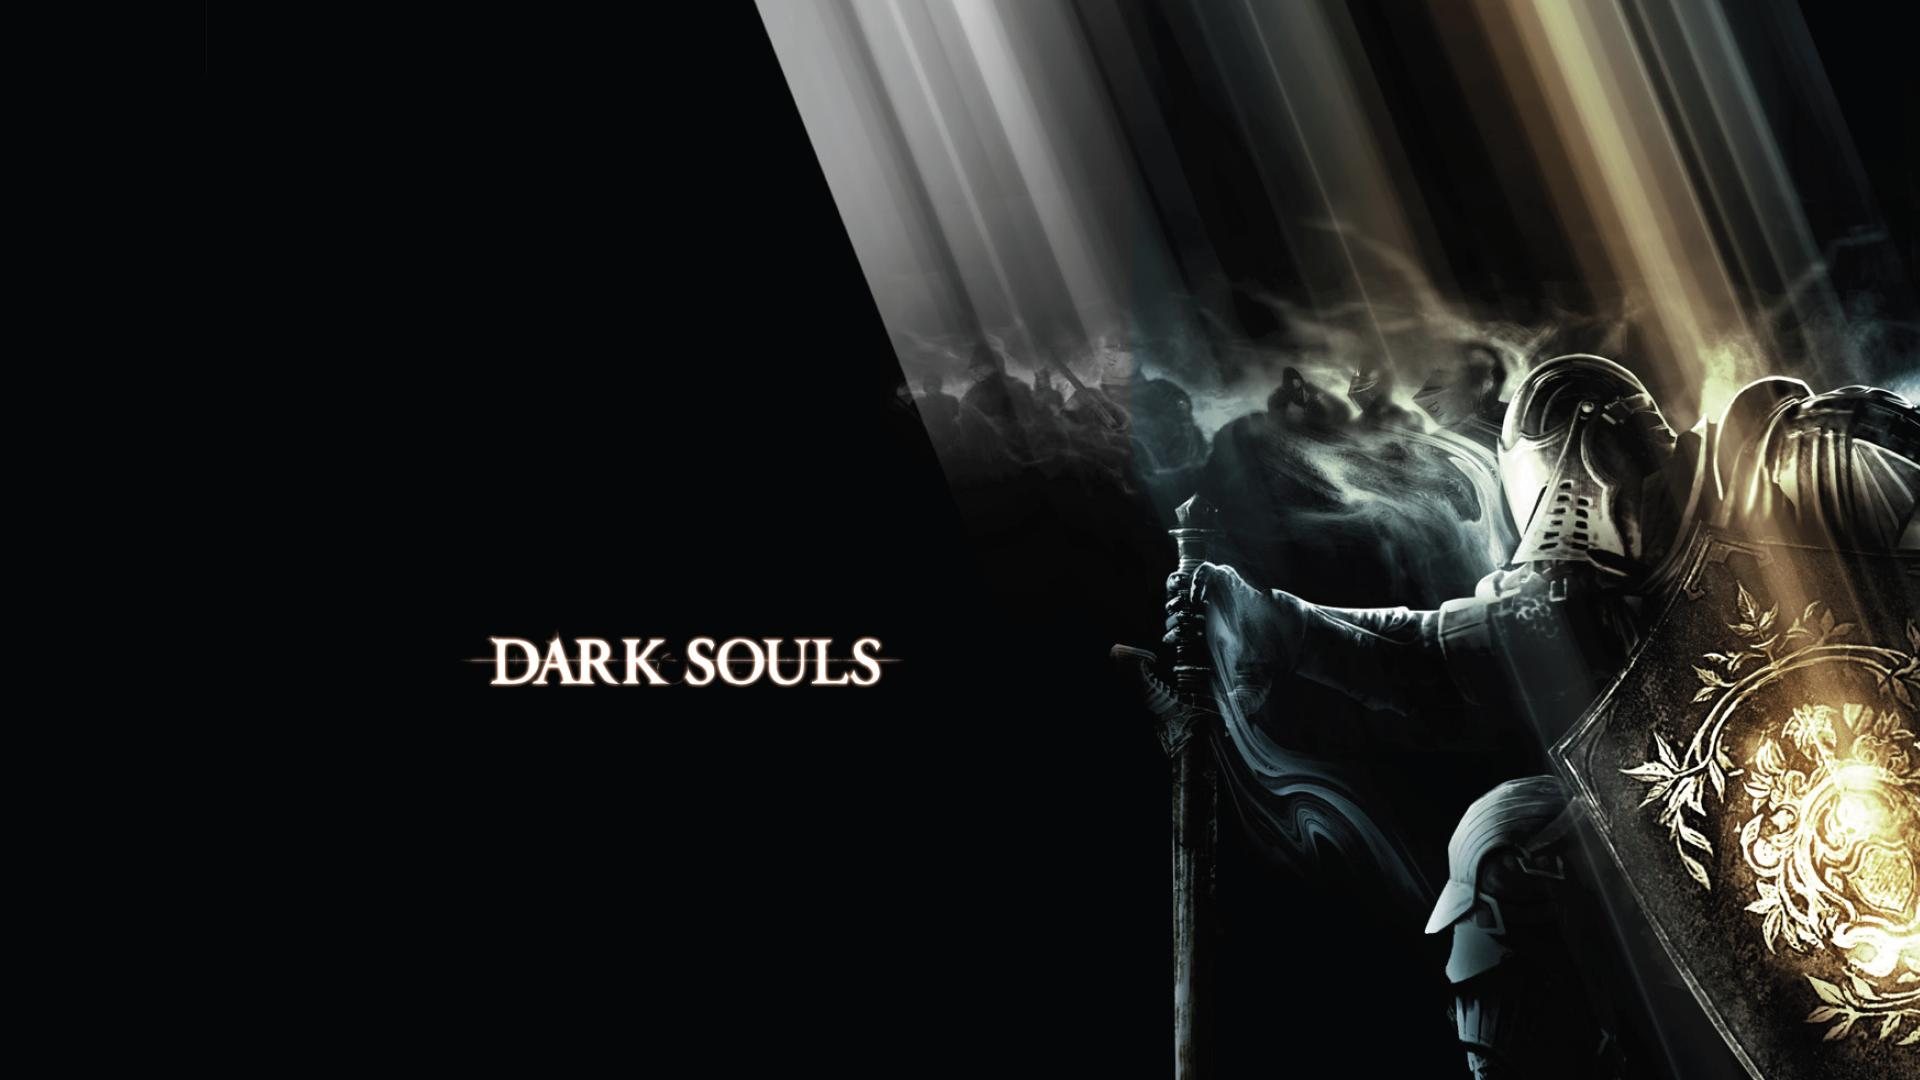 75 Dark Souls Backgrounds On Wallpapersafari